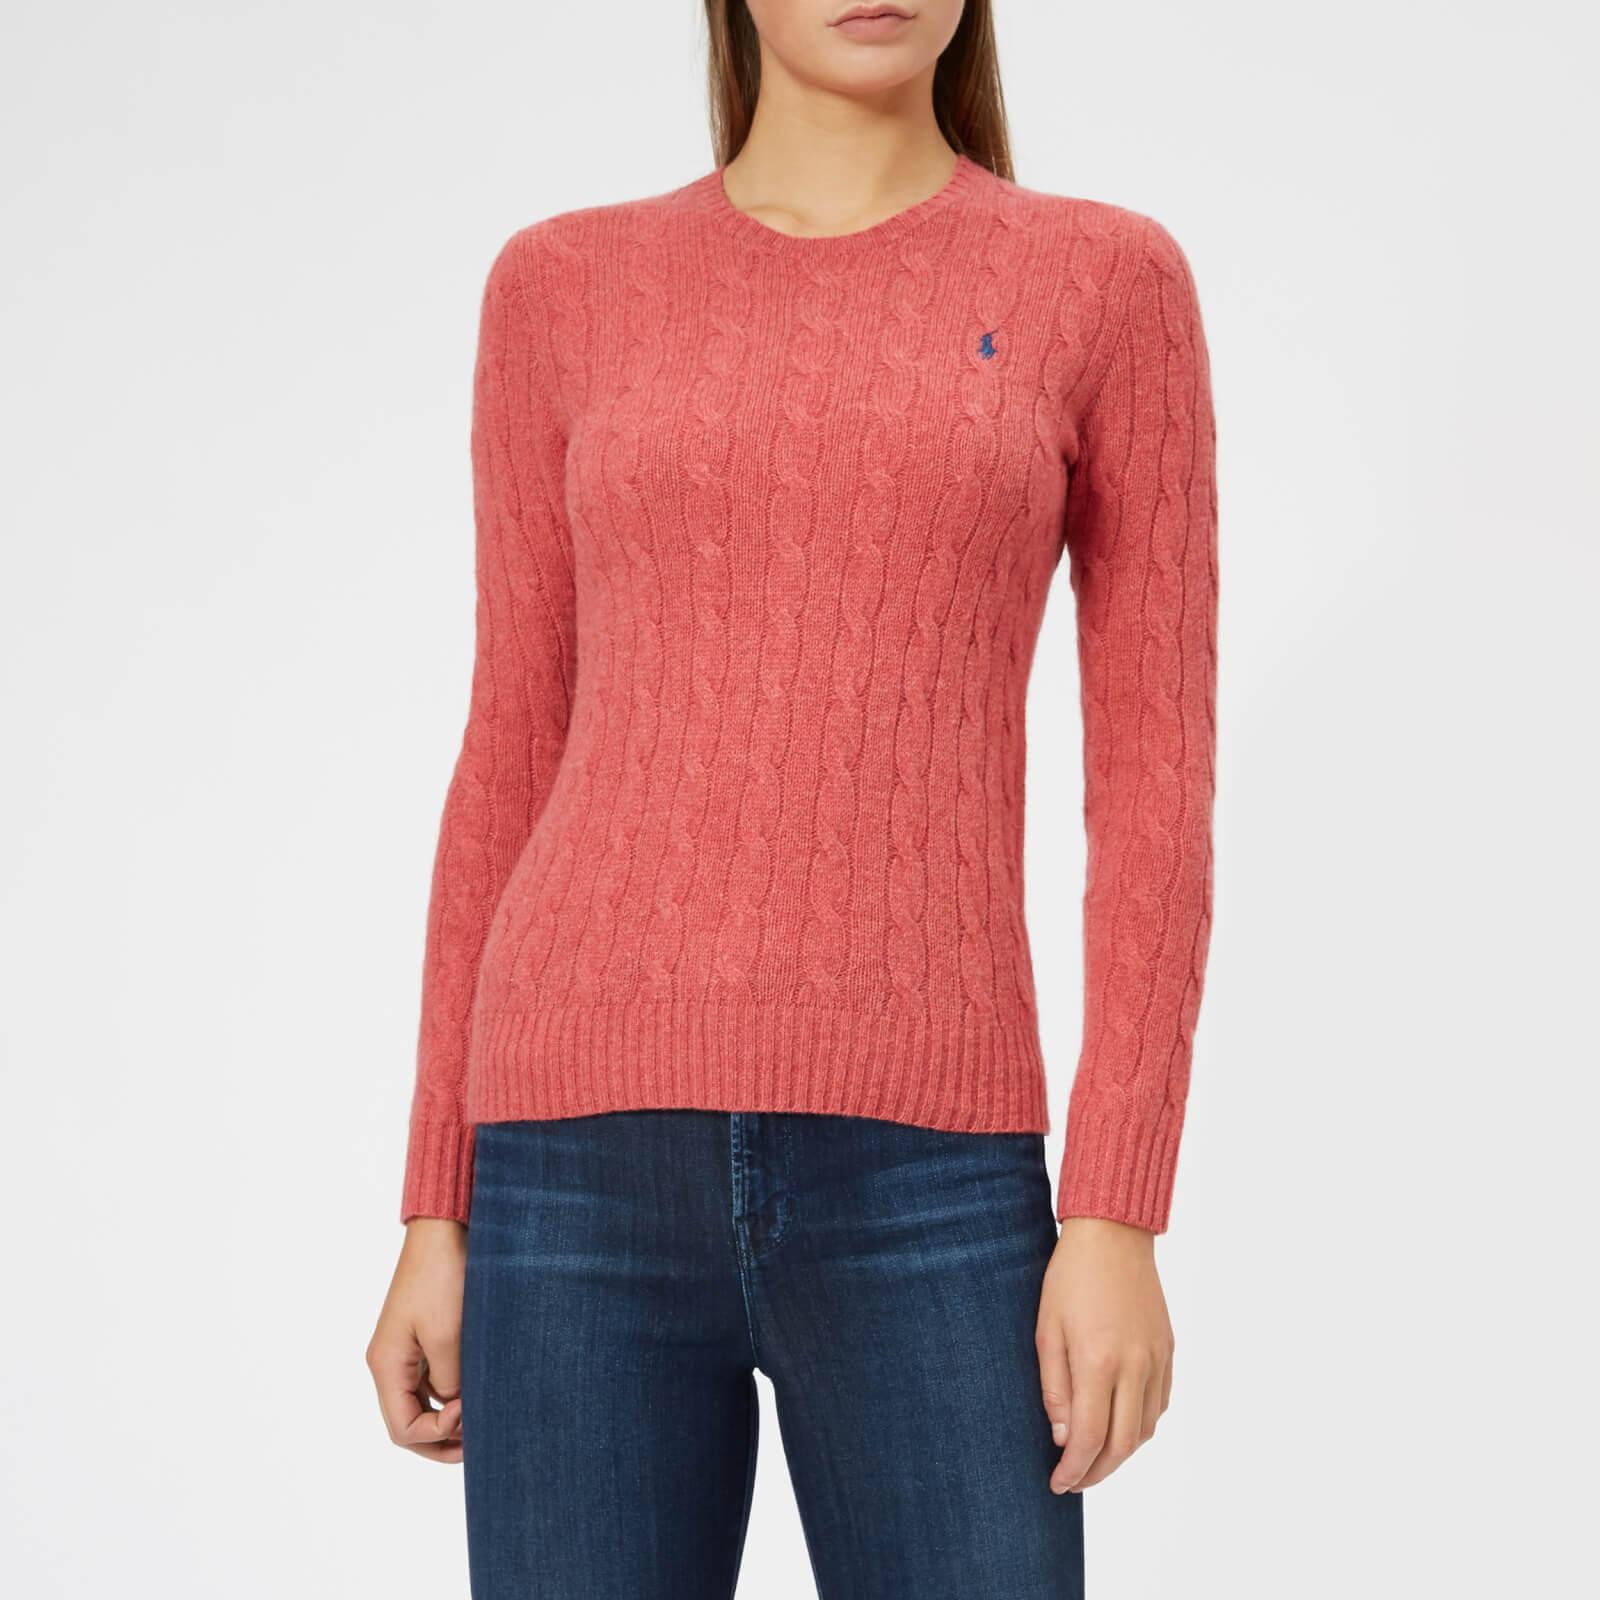 57fbdca49702 Polo Ralph Lauren Women's Julianna Jumper - Pink - Free UK Delivery over £50